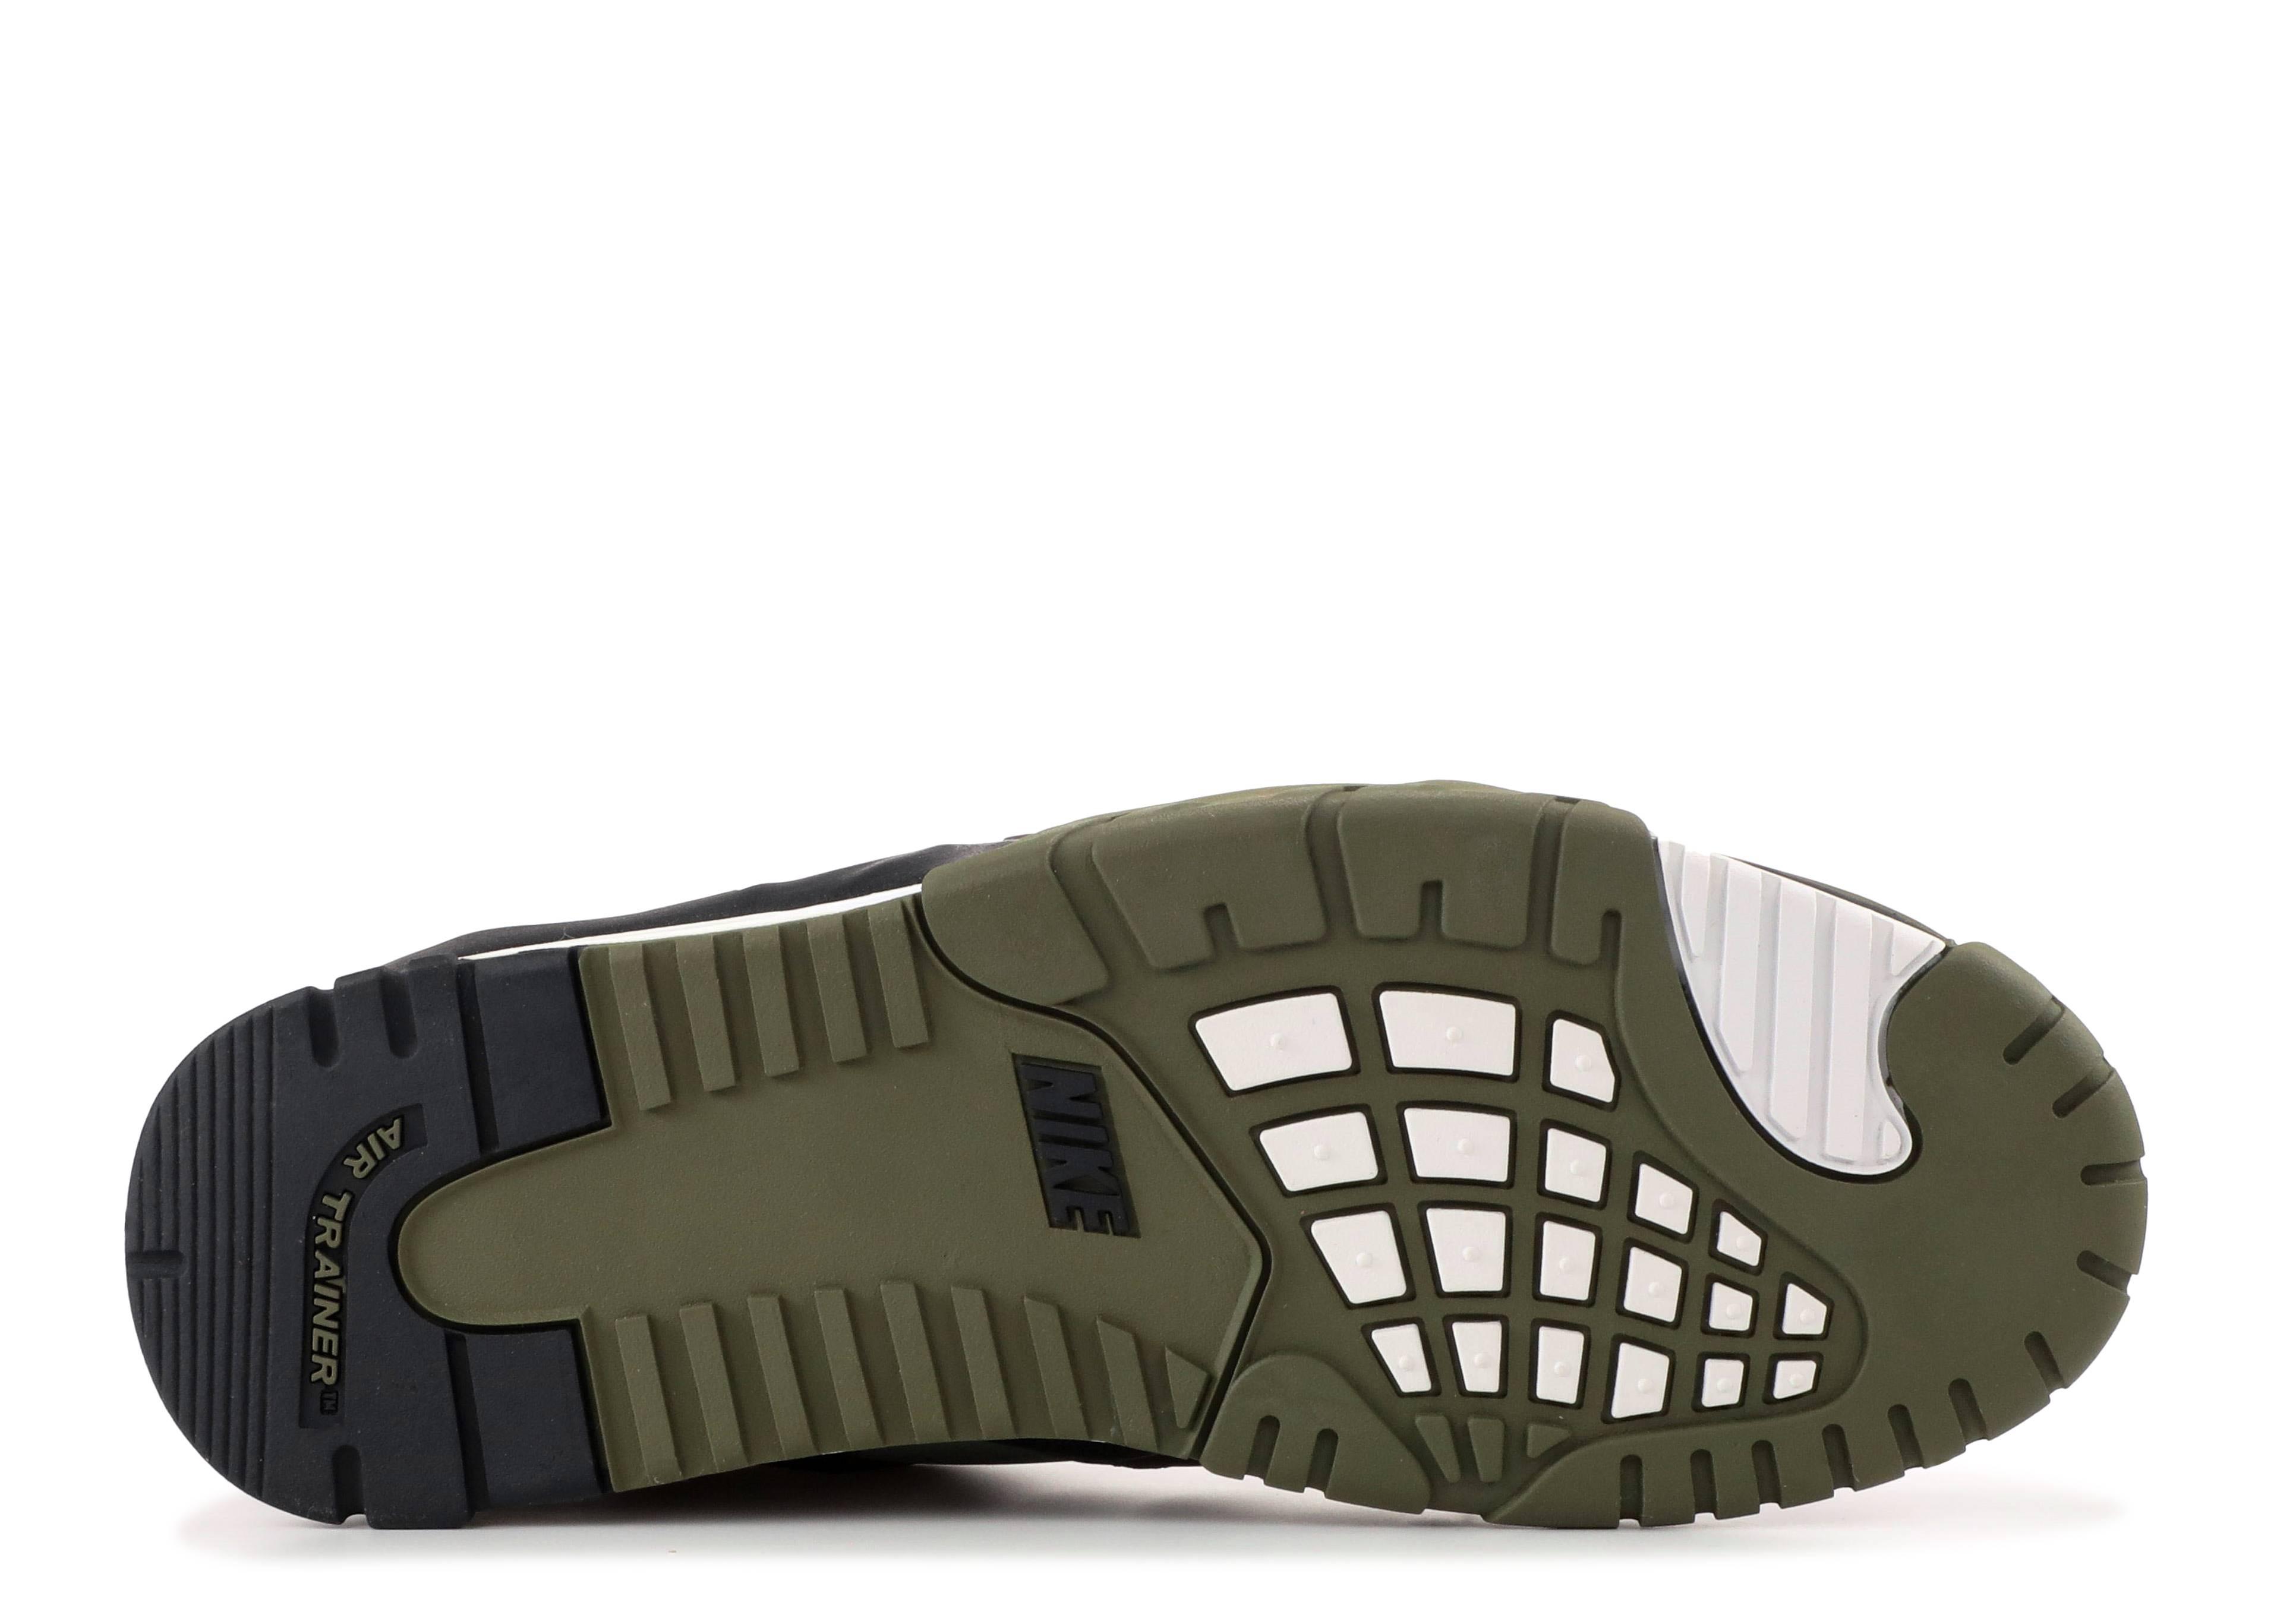 f4e5df9a49237 Air Trainer 3 - Nike - 705426 300 - jade stone/mdm olive-blk-white ...